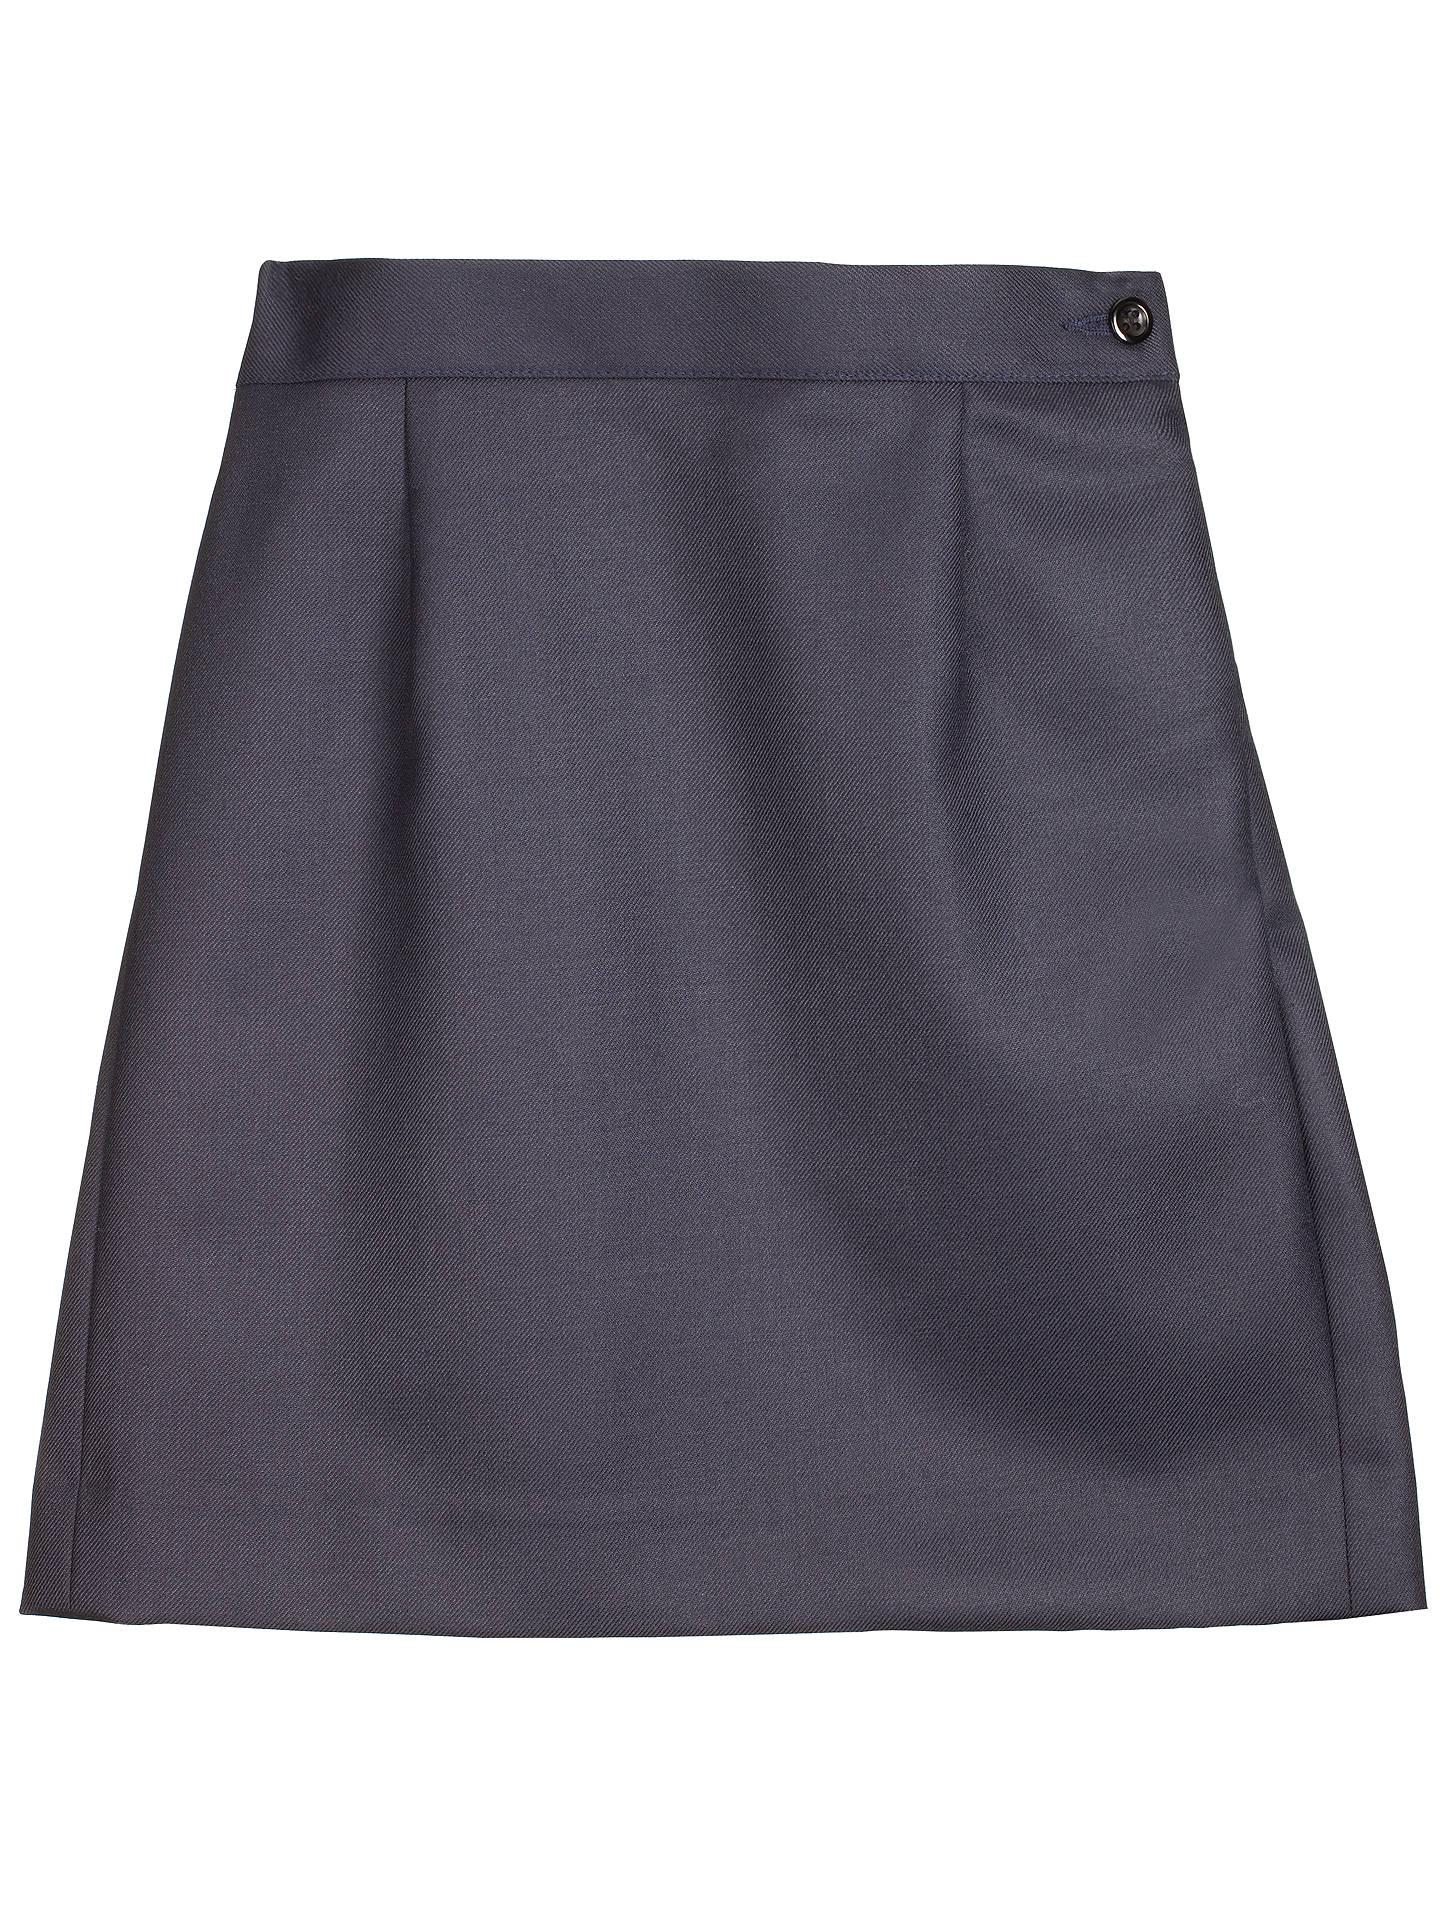 3eb9ca5e104e5 Girls' School Wool Mix Pencil Skirt, Navy at John Lewis & Partners